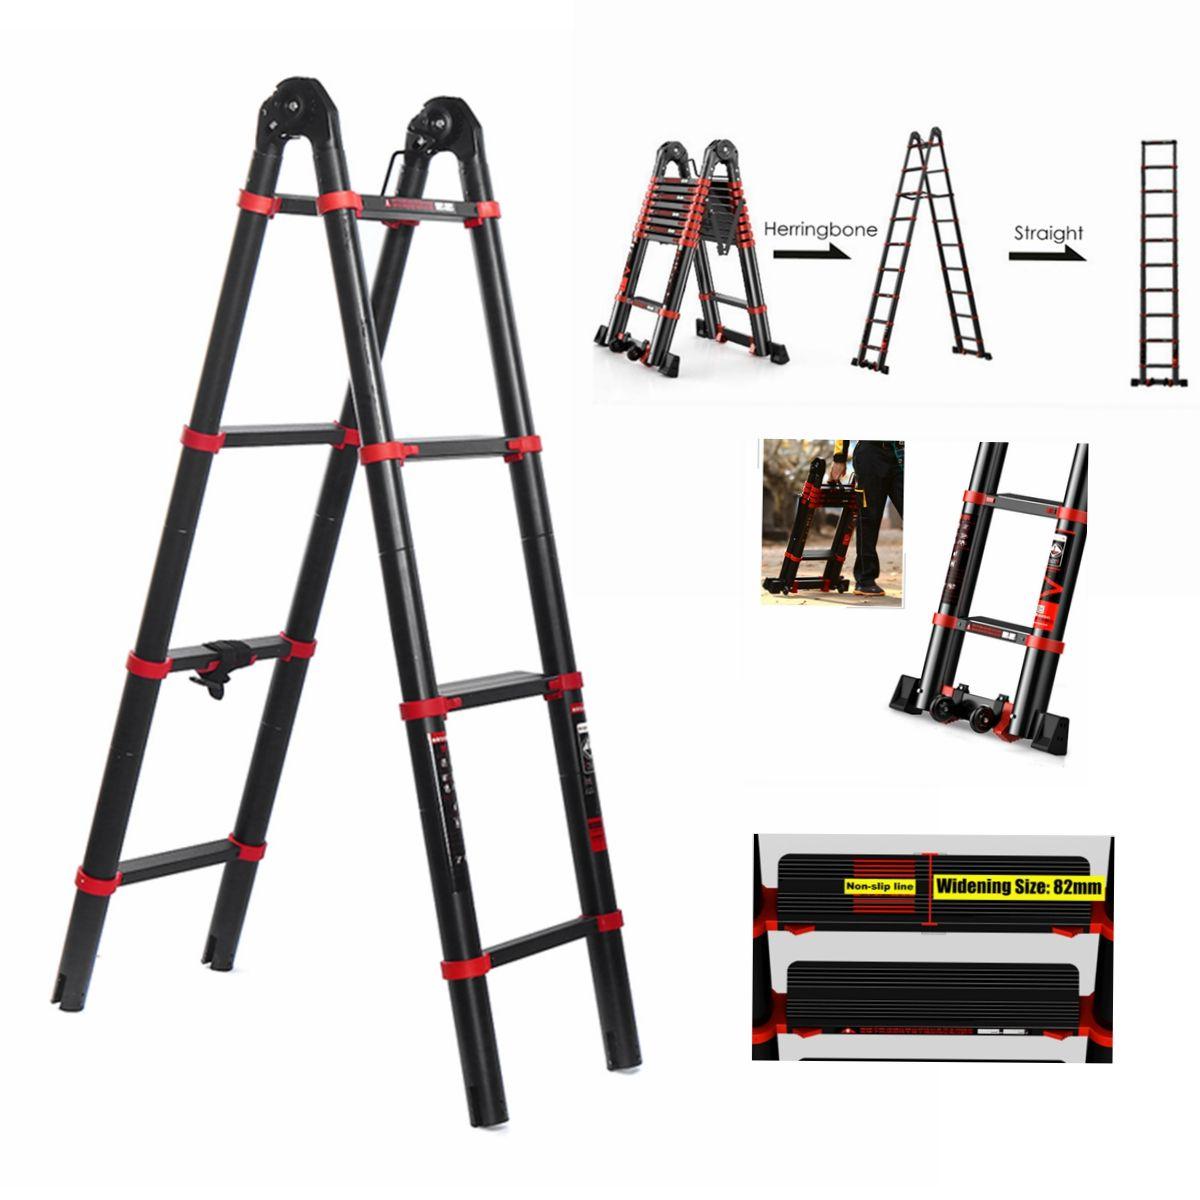 Heavy Duty Aluminum Ladder Stable Step Ladder Telescoping Extension Ladder W Wheels Non Slip Rubber Feet Indoor Outdoor Repairing Ceiling Lights Painting Walls In 2020 Step Ladders Aluminium Ladder Ladder